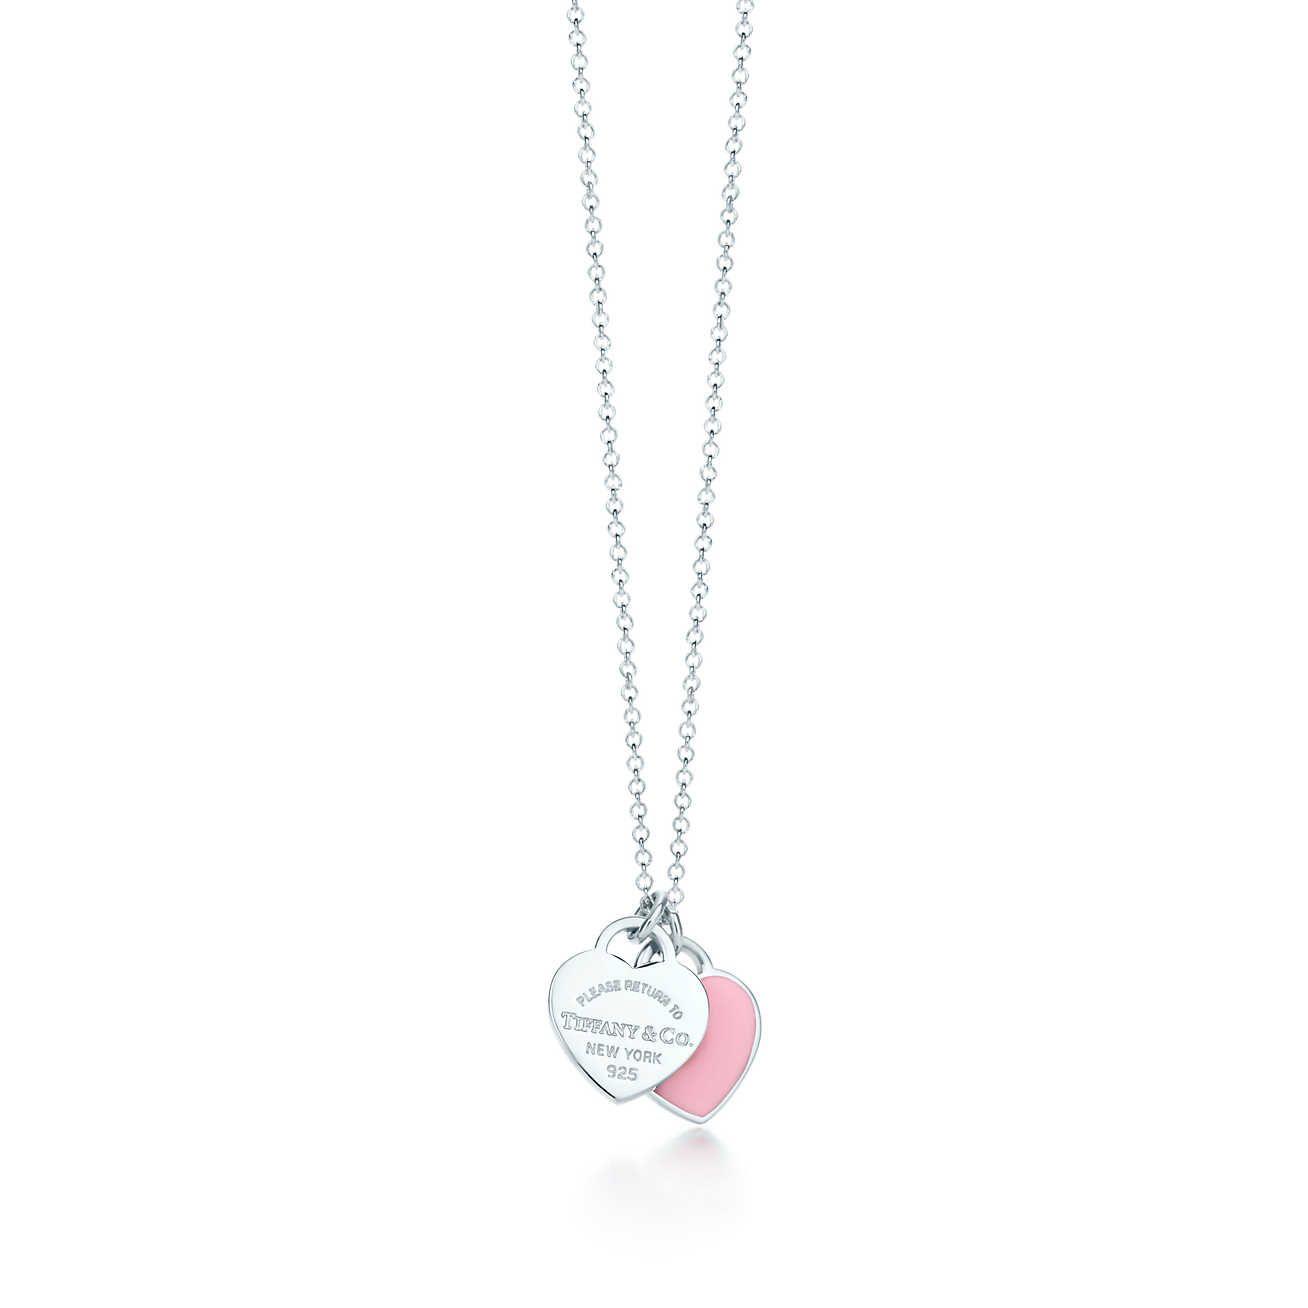 Return to tiffany mini double heart tag pendant tiffany pendants return to tiffany mini double heart tag pendant in silver with pink enamel finish tiffany co aloadofball Choice Image